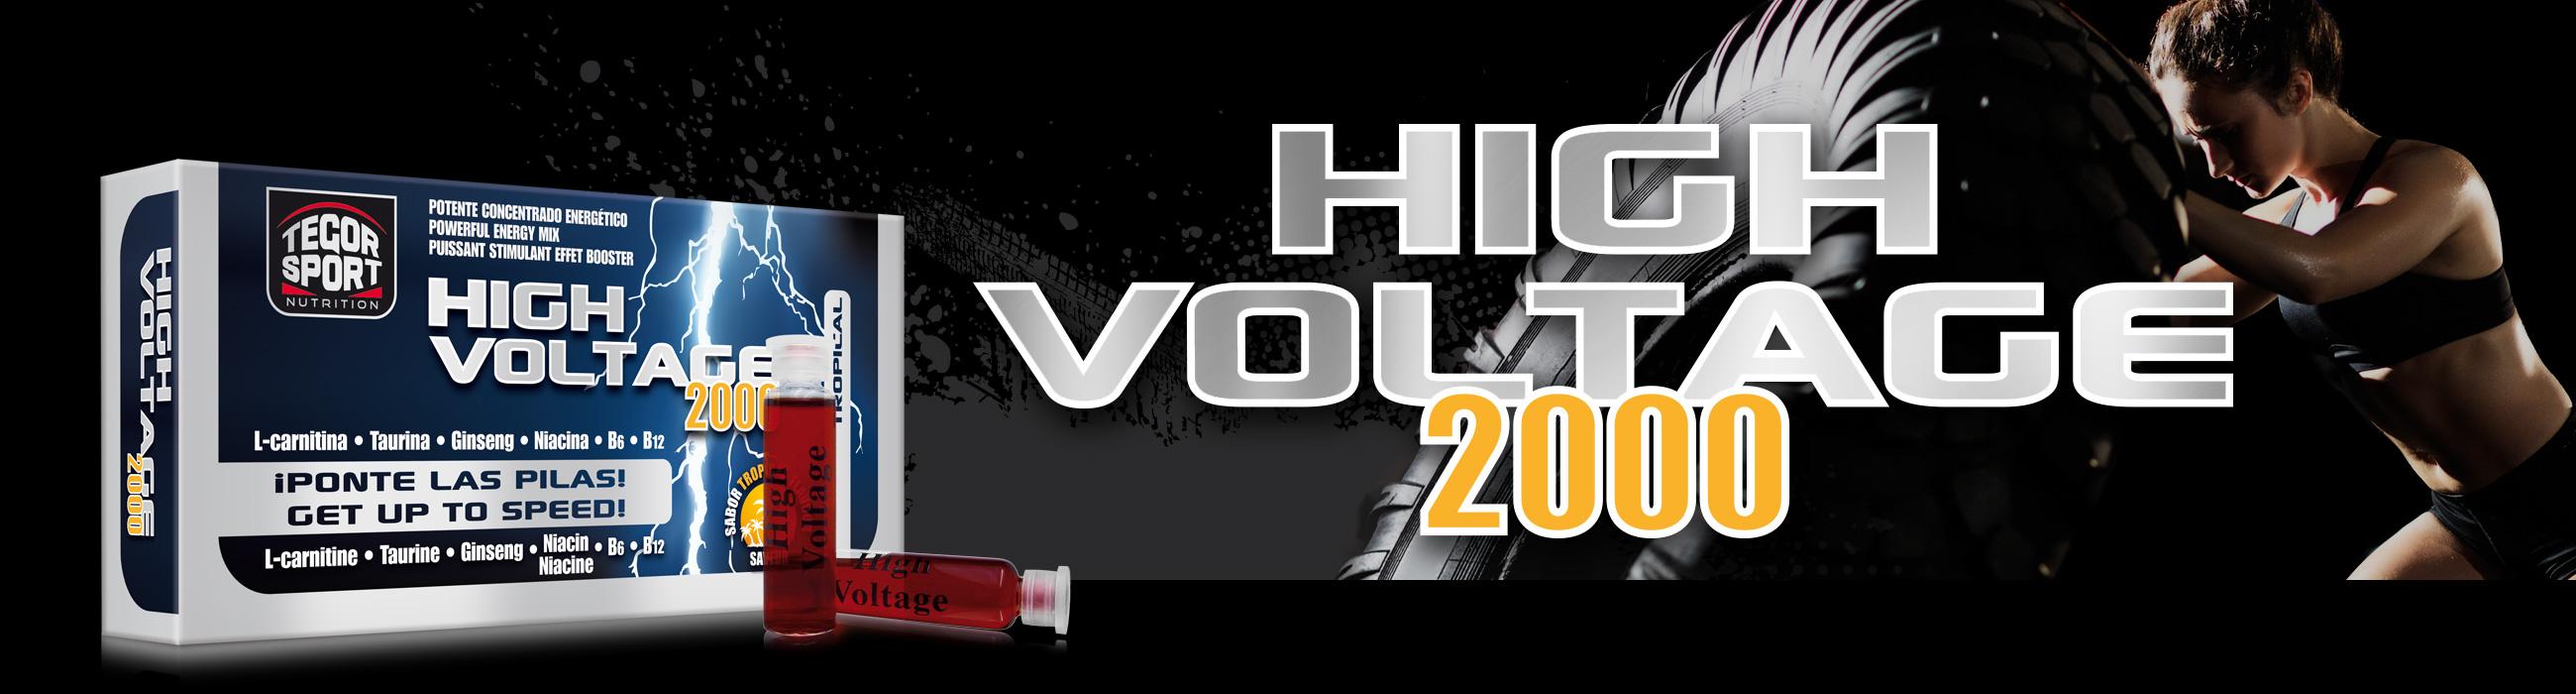 Cabecera High Voltage